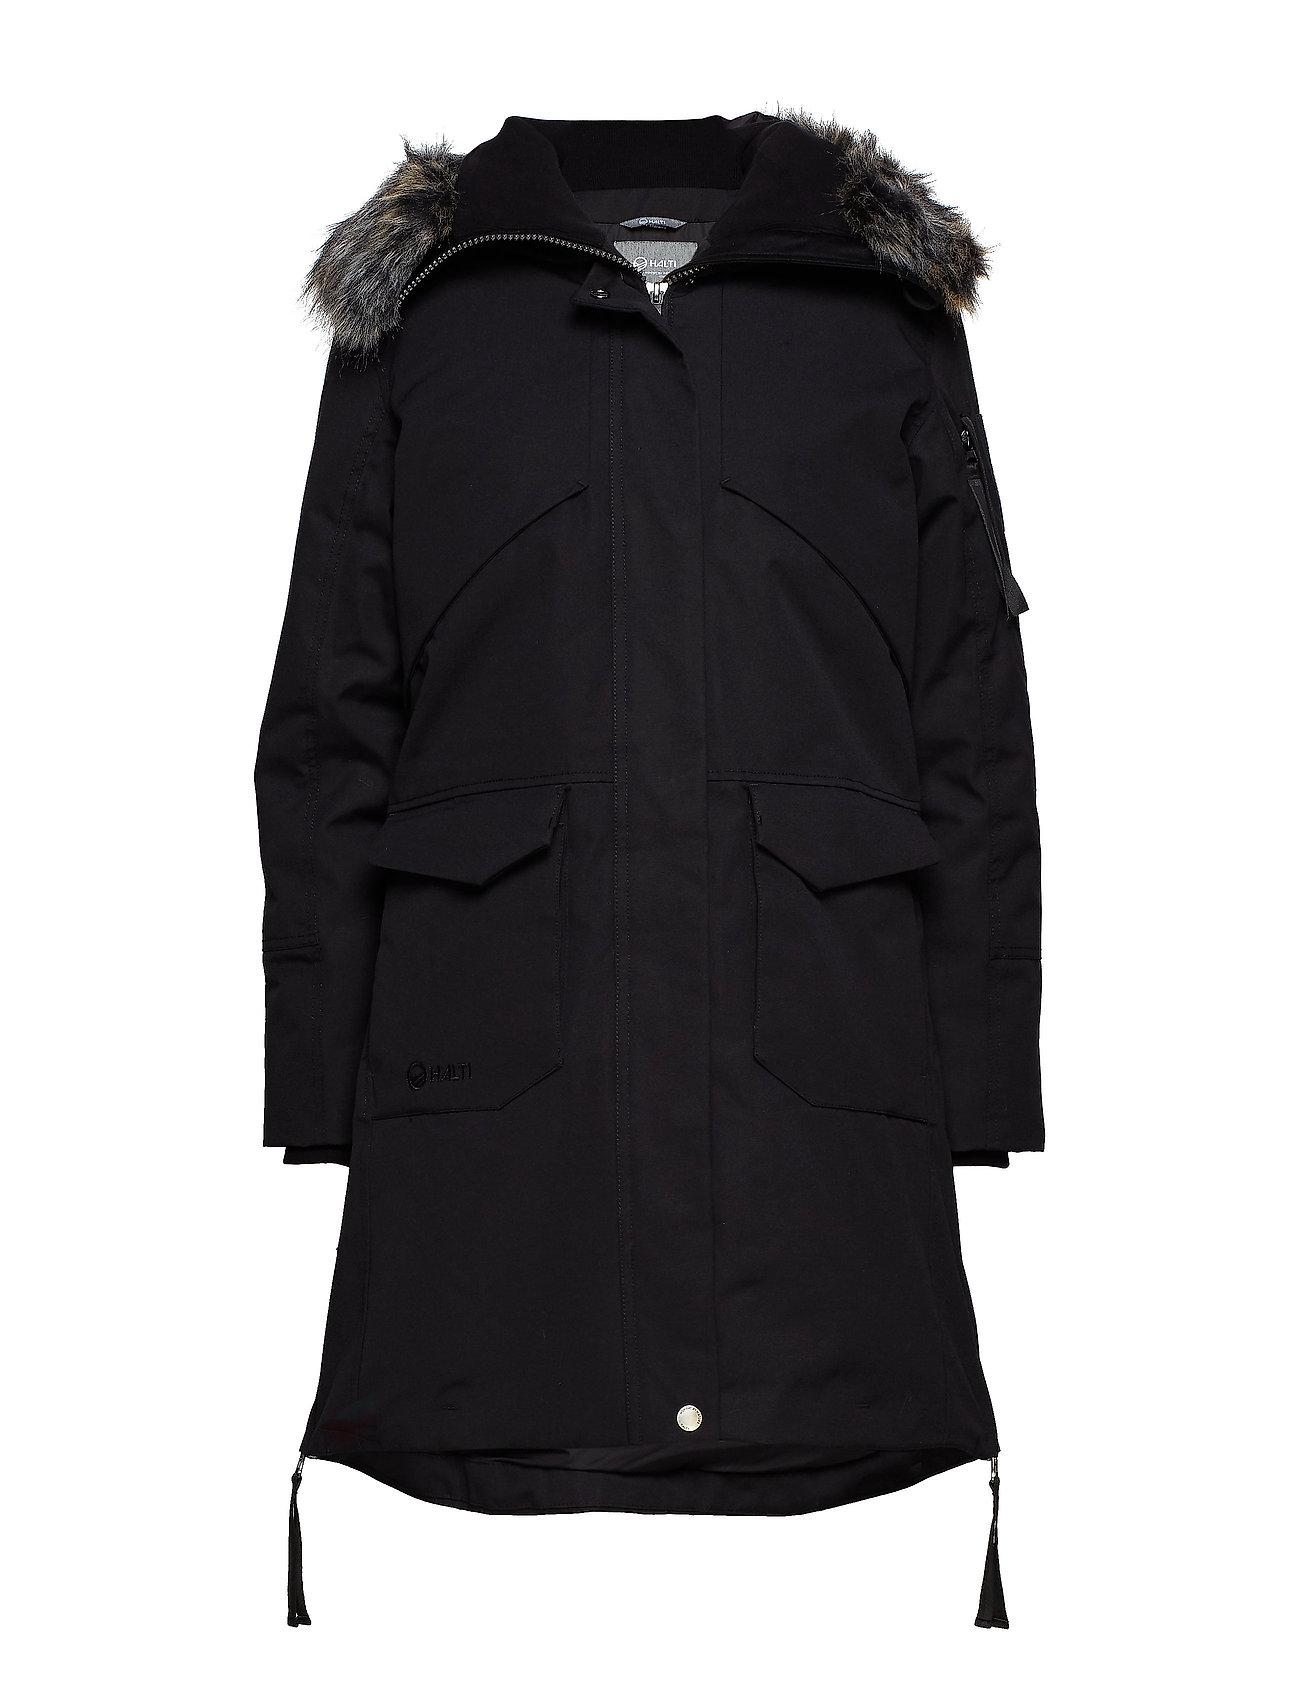 Halti Osaka W parka jacket - BLACK